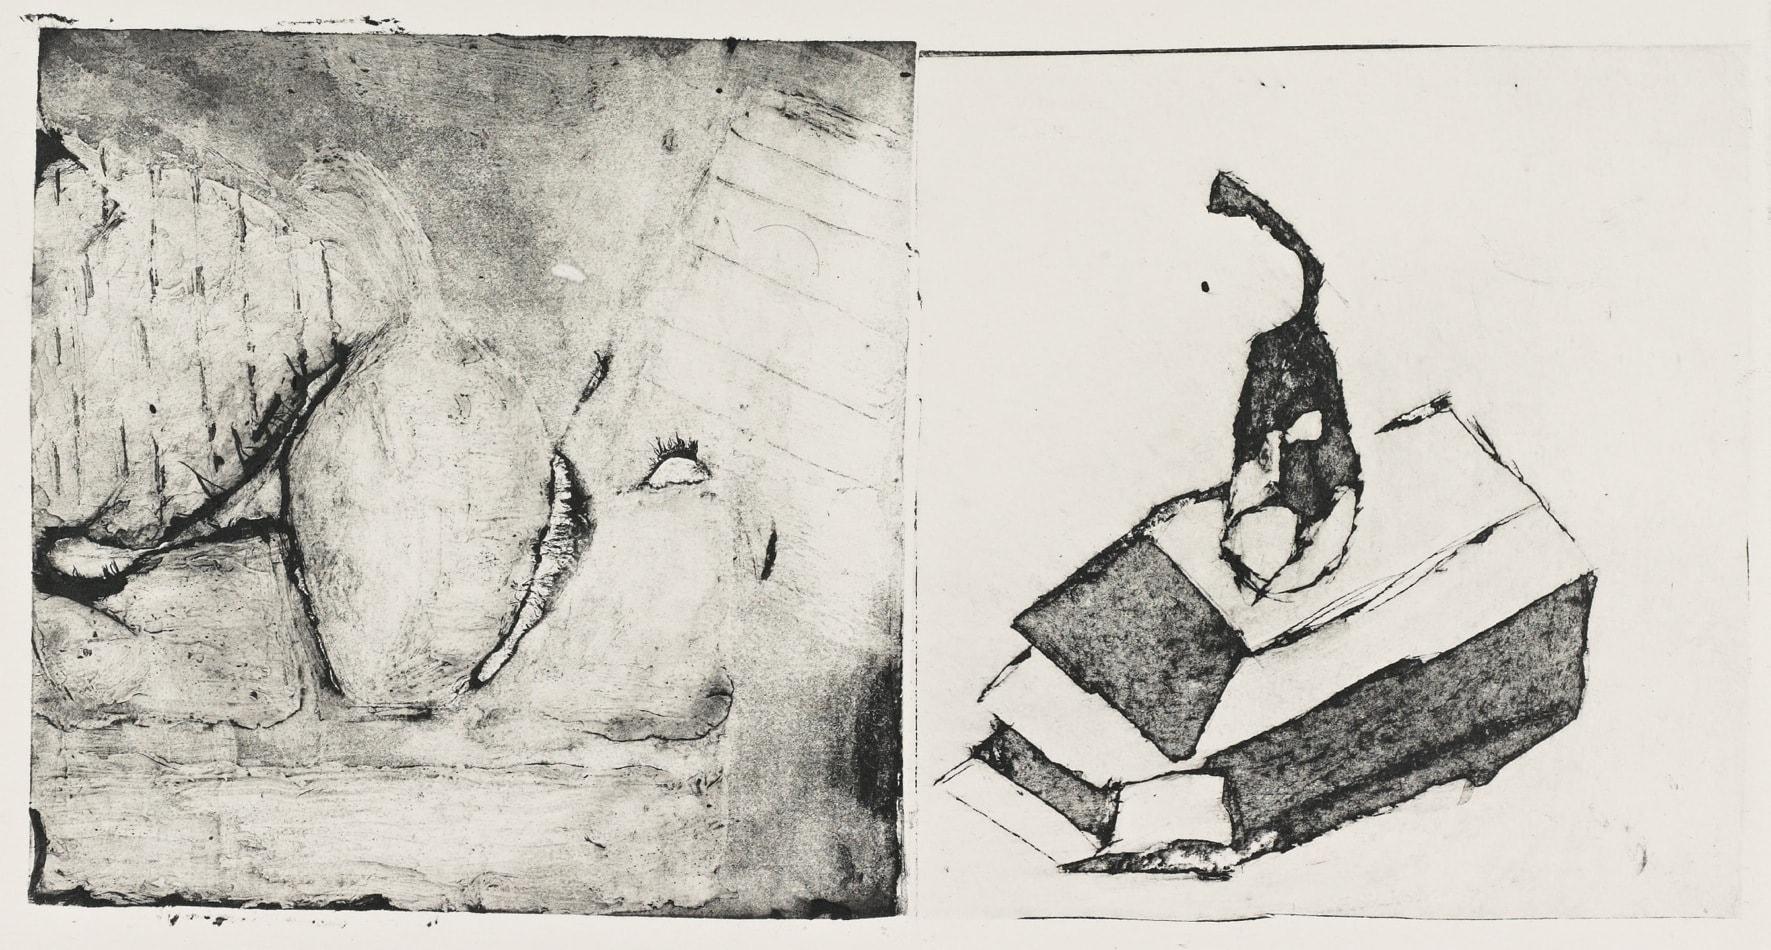 Poires - Gravure - David Kennedy artiste peintre